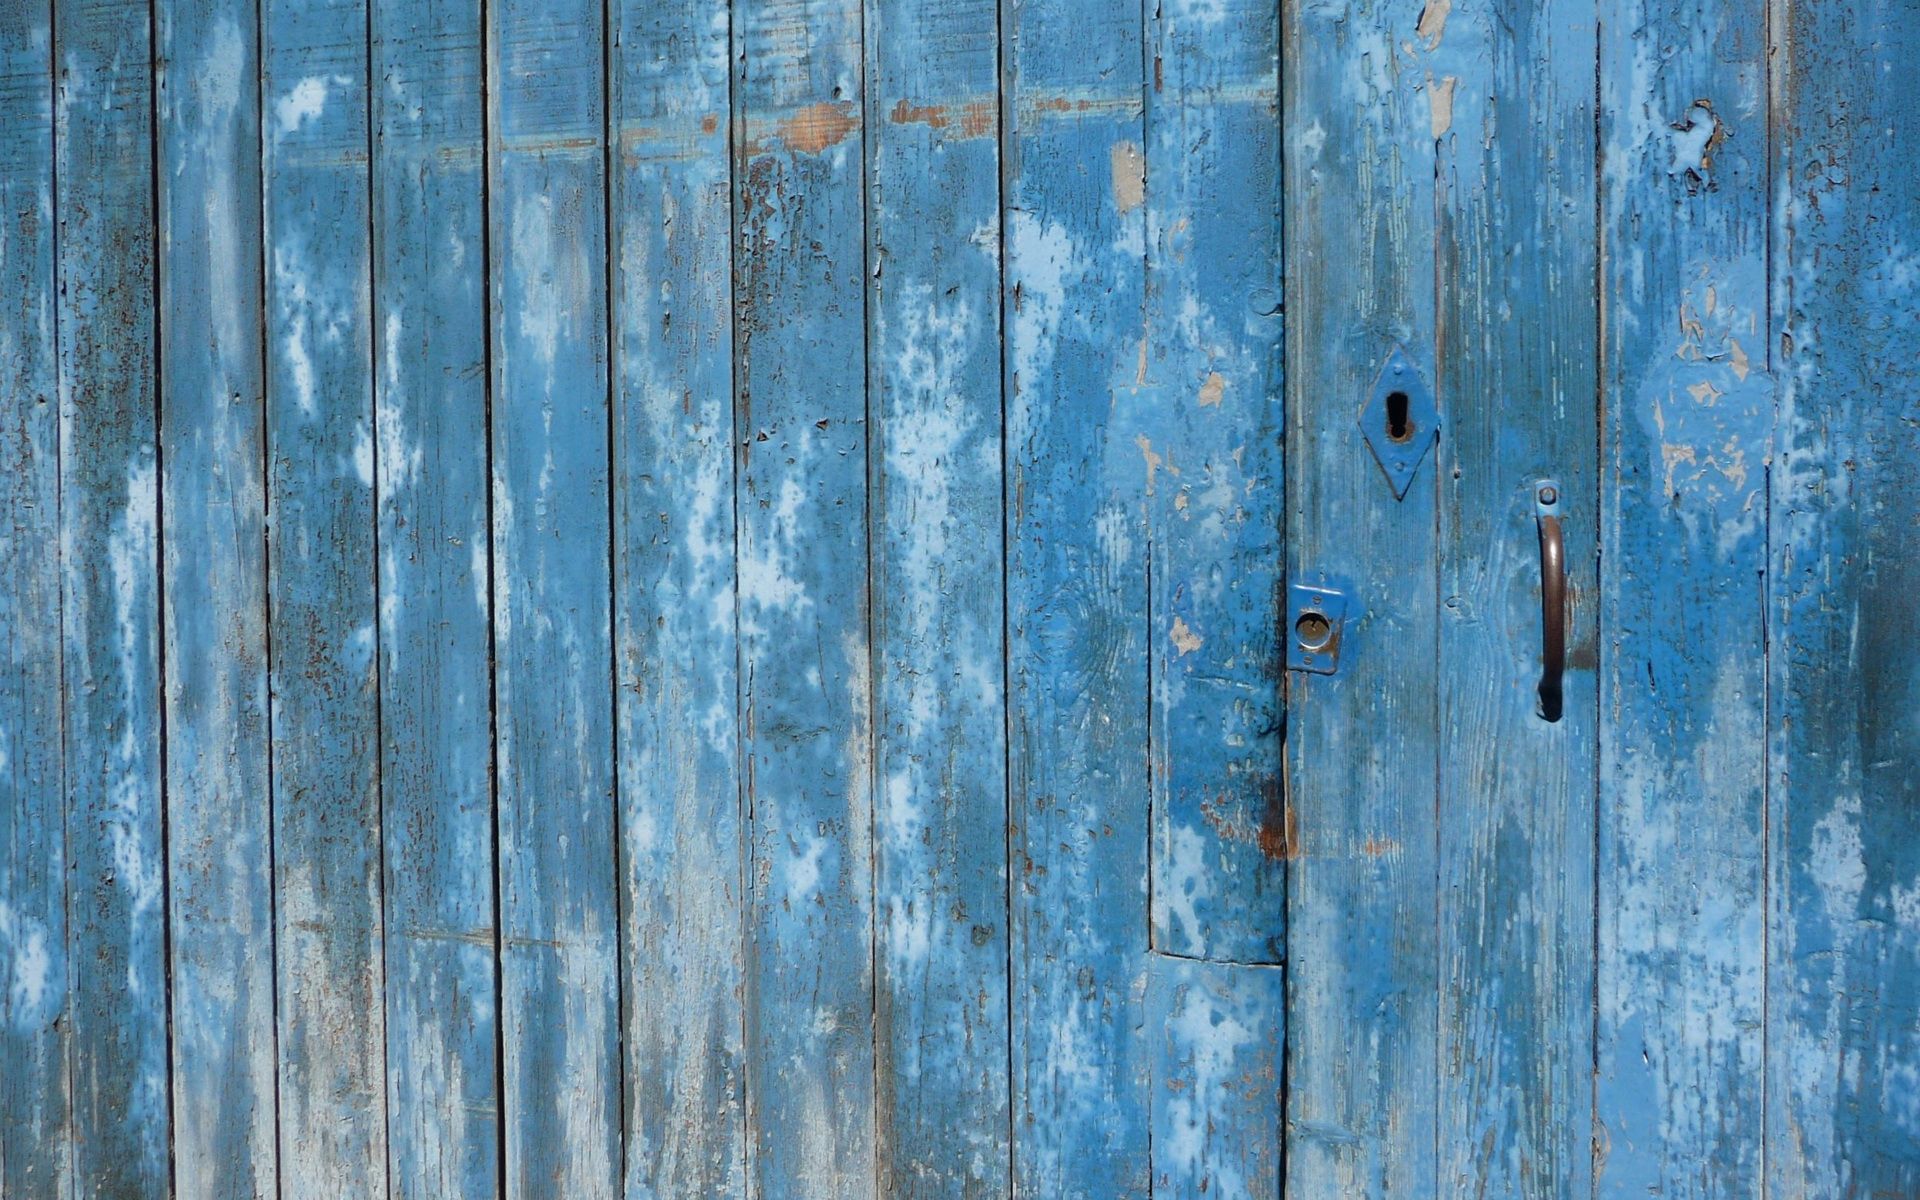 Blue Wood Wallpaper on Painted Floor Pattern